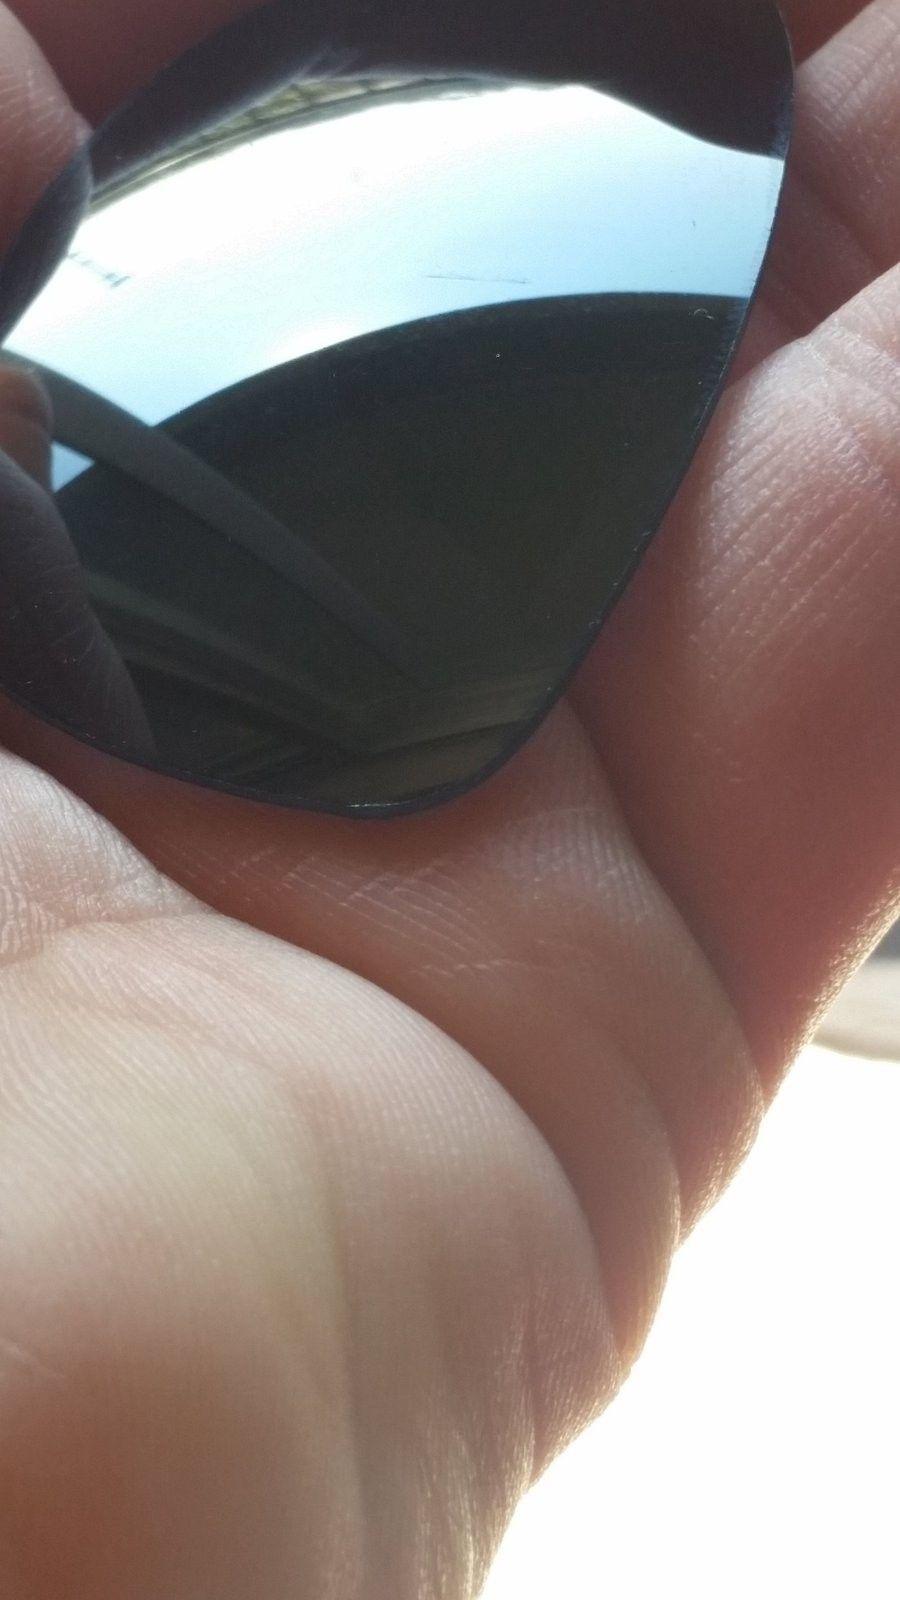 Oakley Ducati and Black iridiumJuliet lenses - uploadfromtaptalk1420652157398.jpg